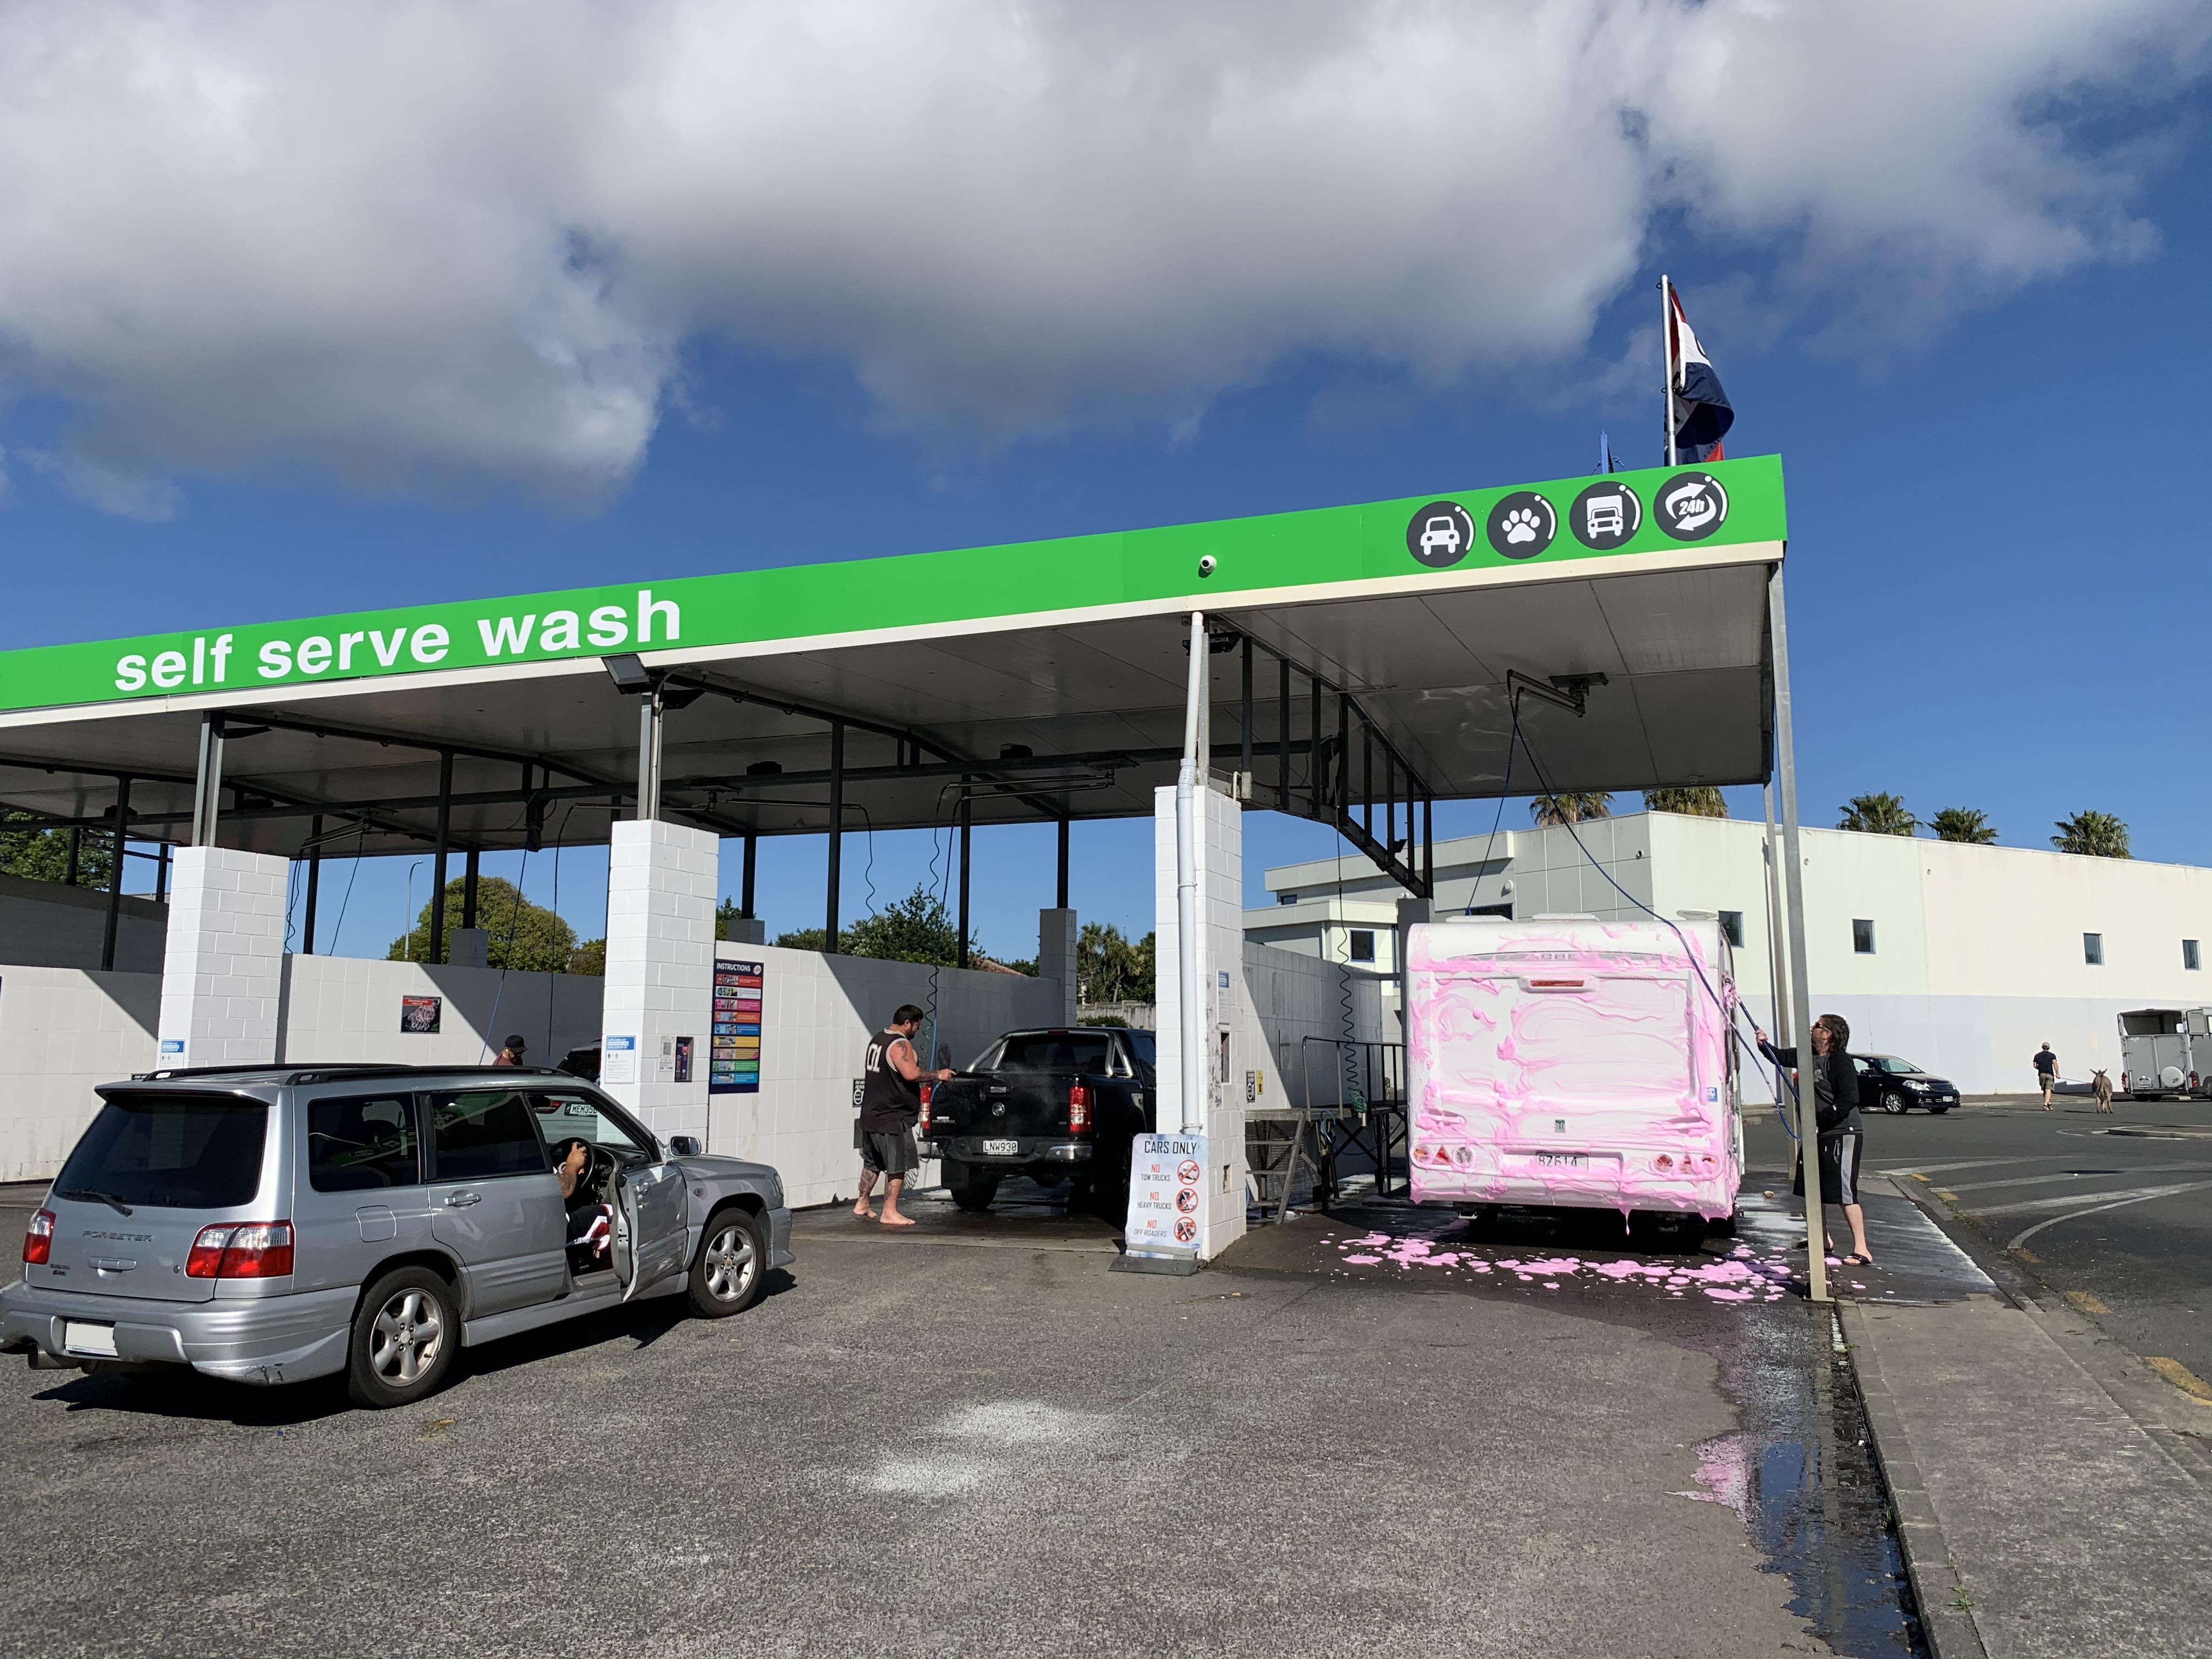 Truck & Campervan Wash